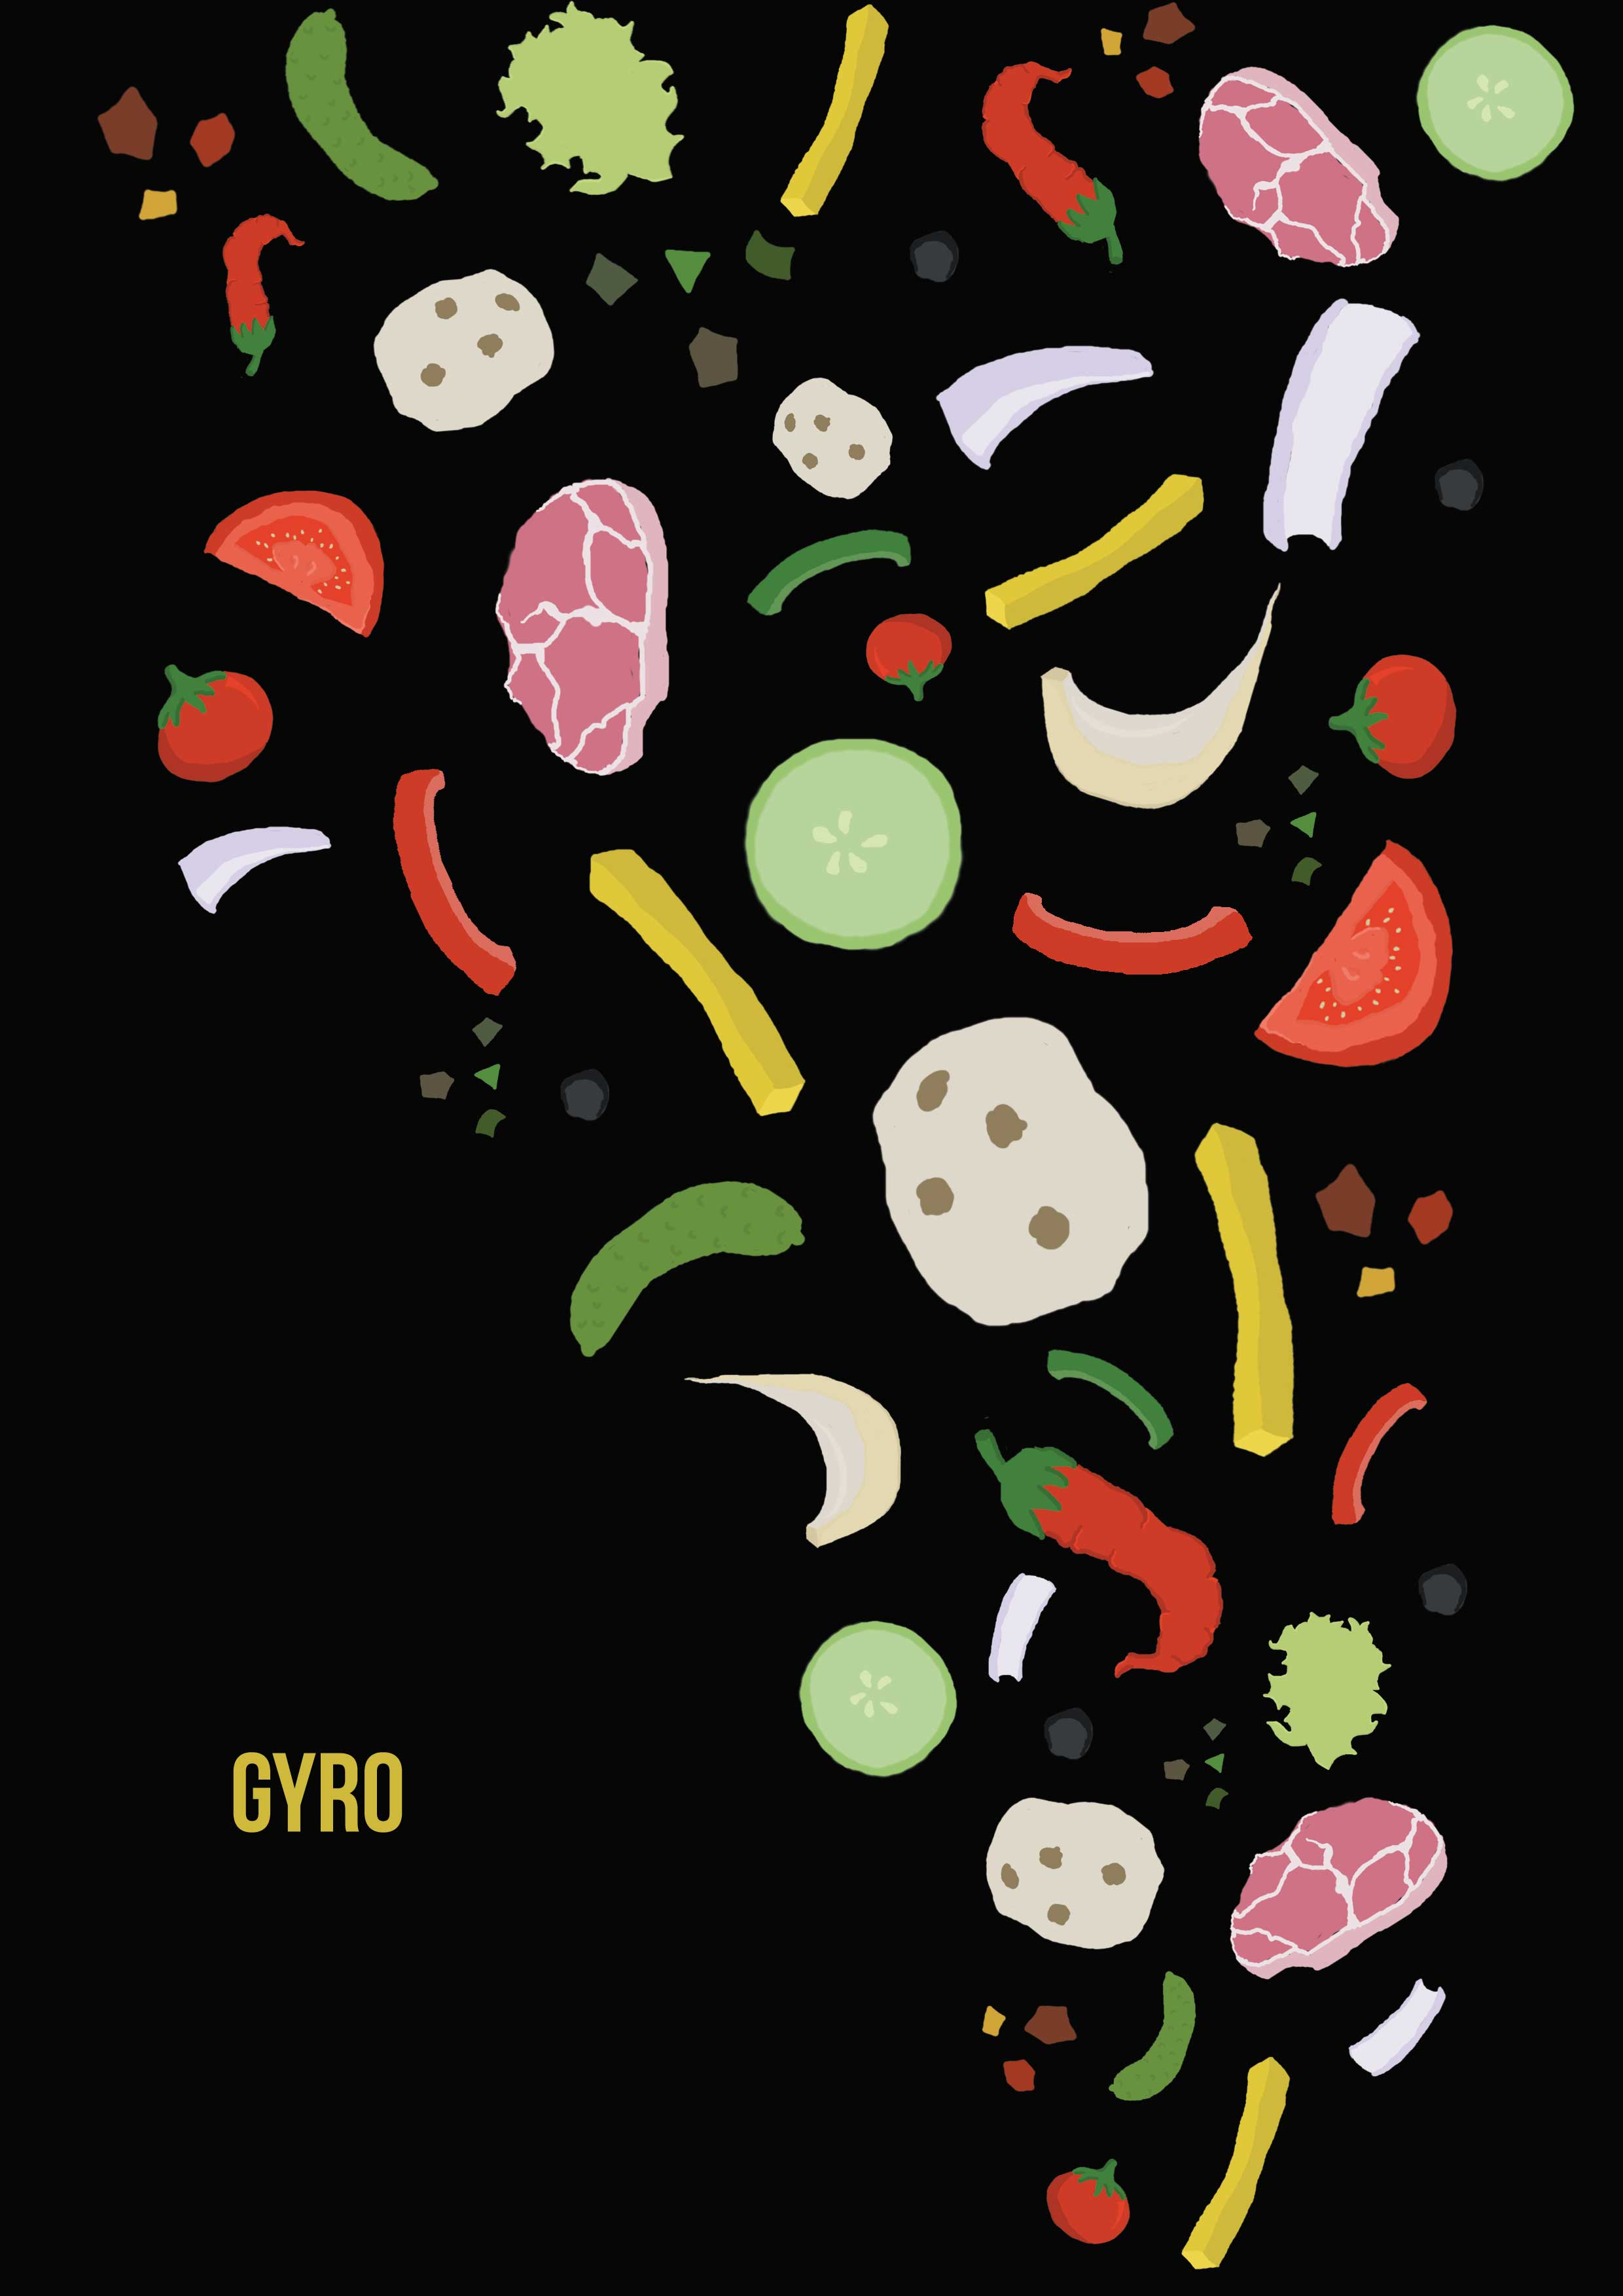 gyro.jpg